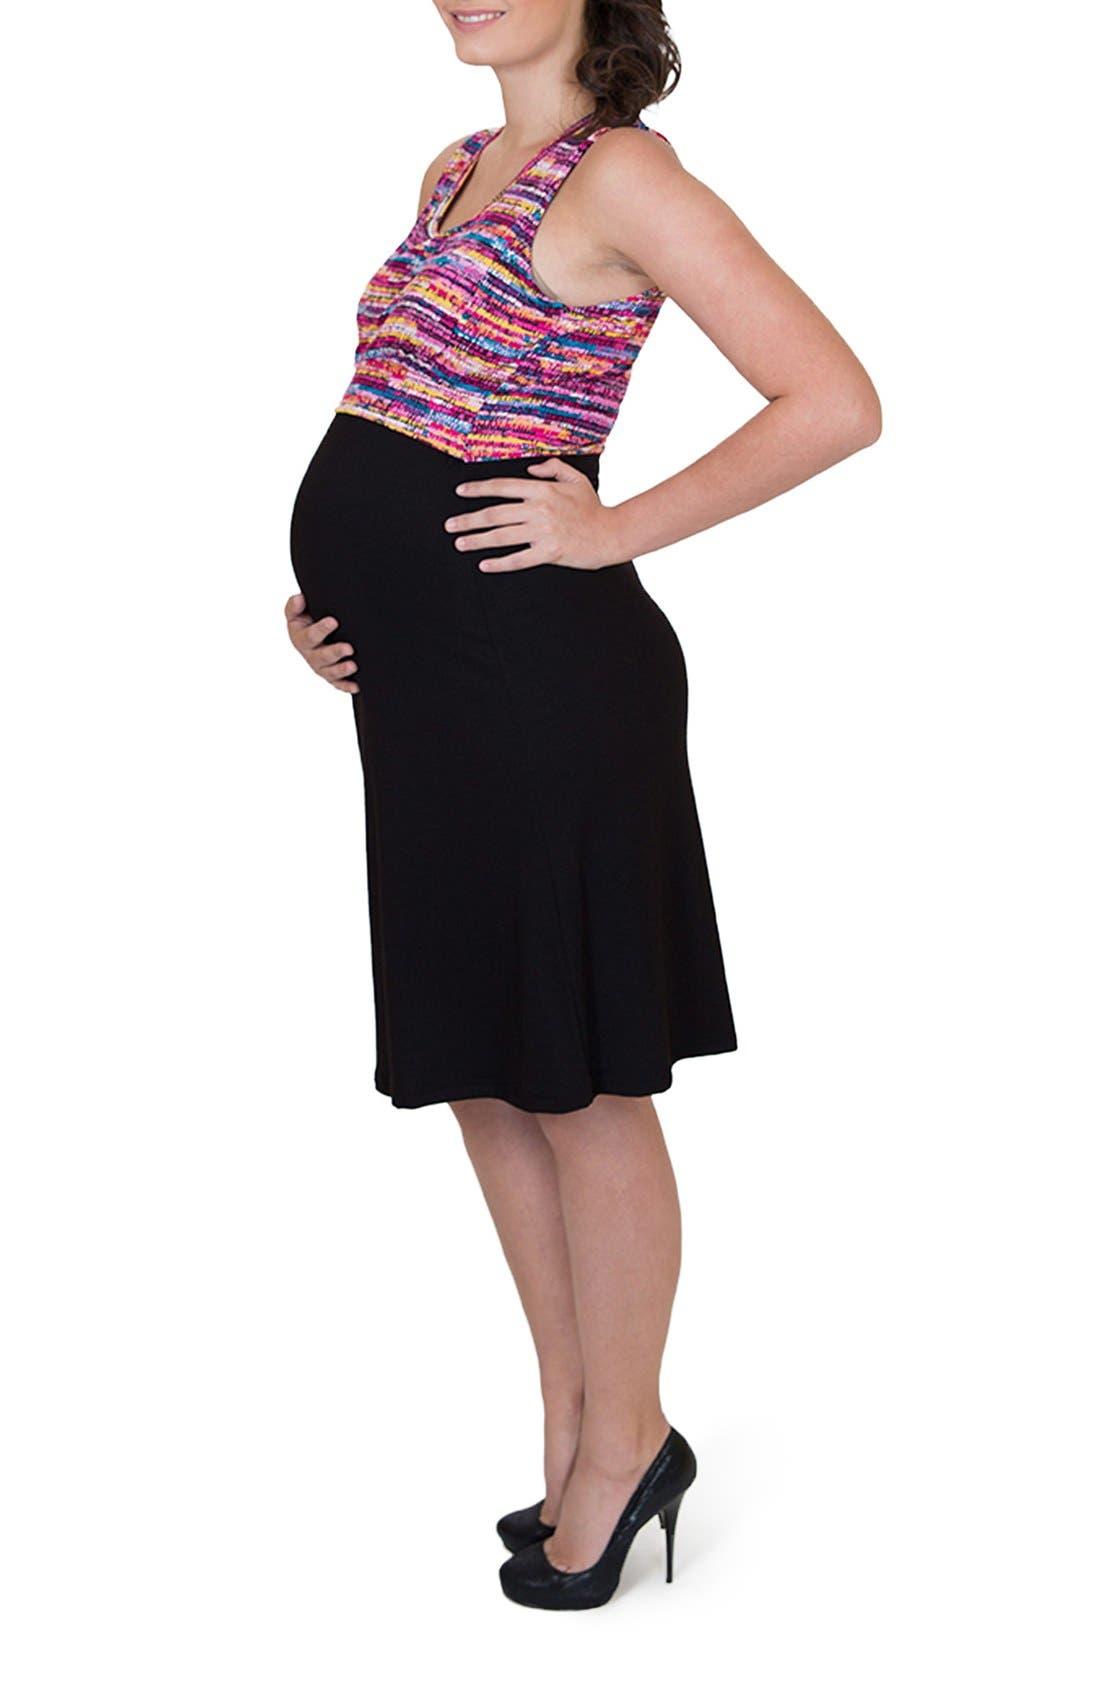 'Ana' Maternity/Nursing Dress,                             Alternate thumbnail 2, color,                             Colorful Top W/ Black Skirt